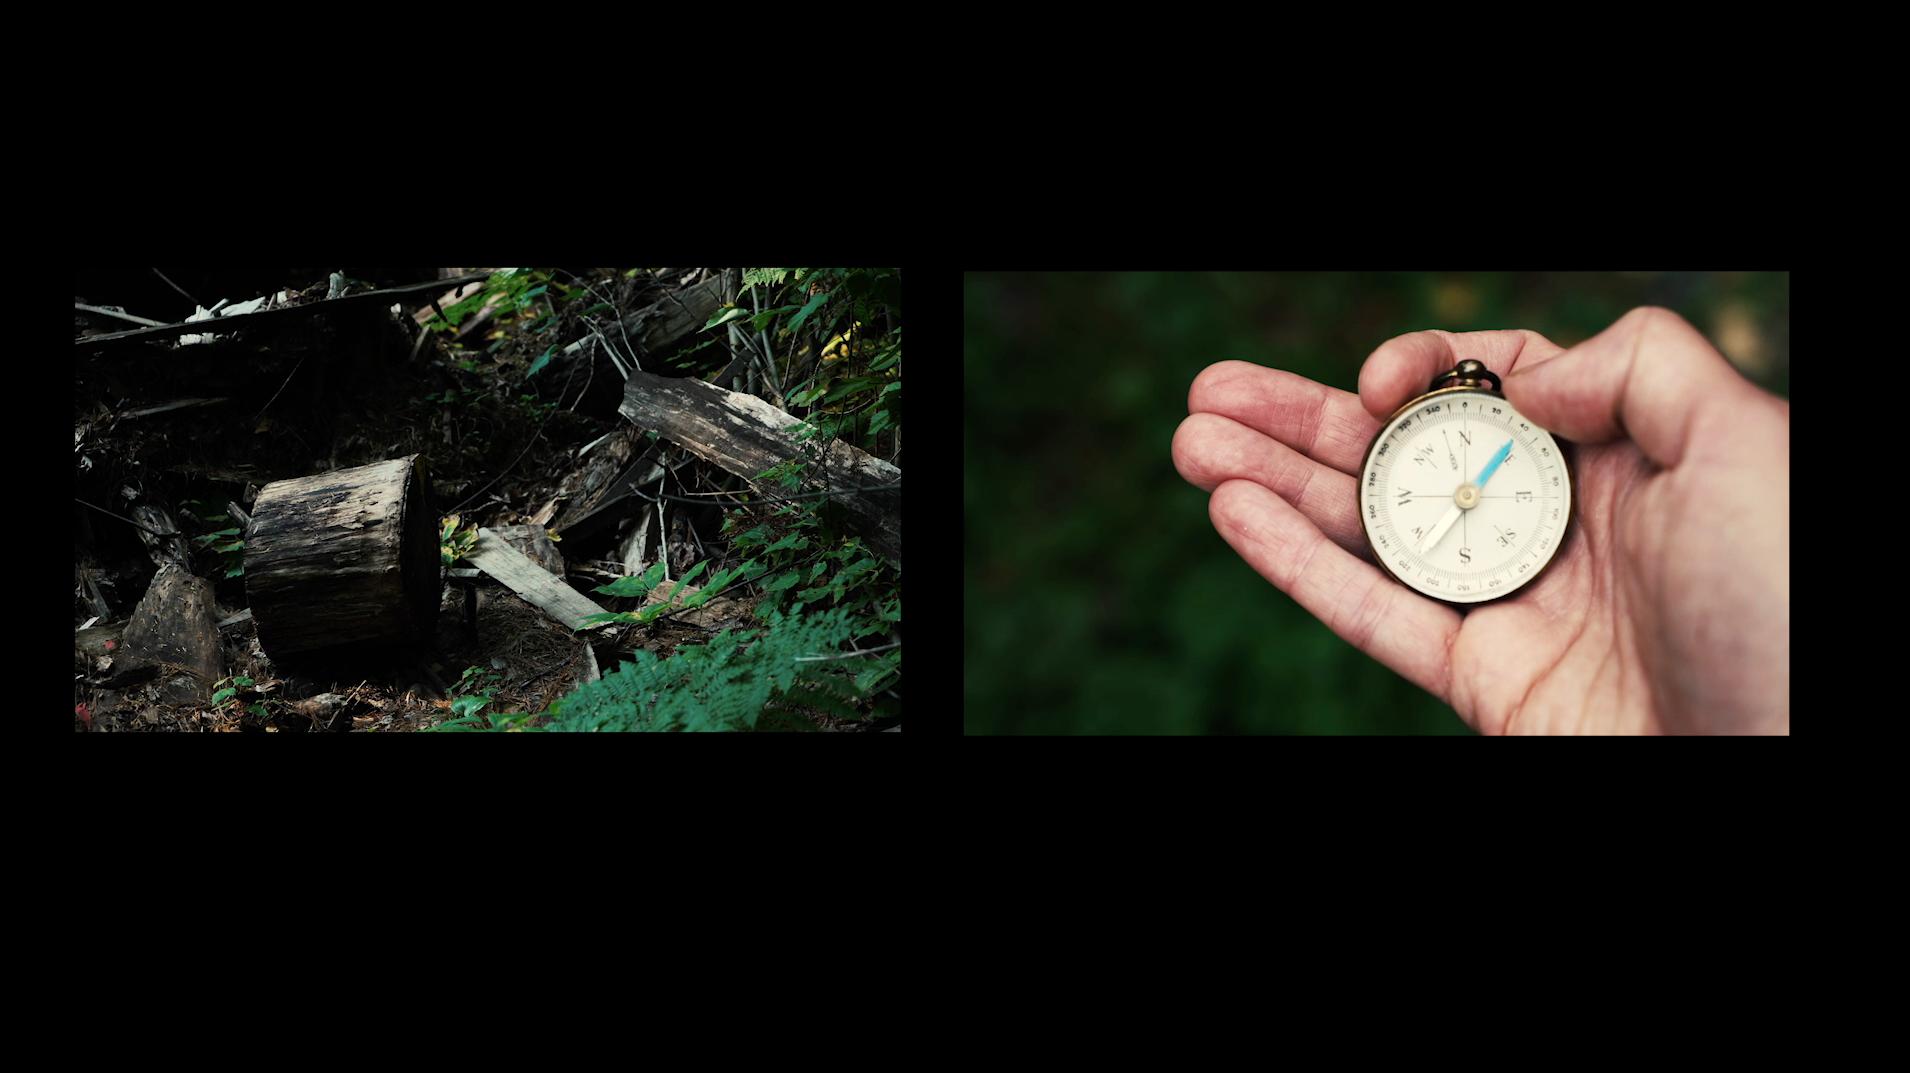 A hand holding a pocket watch, a tree stomp.